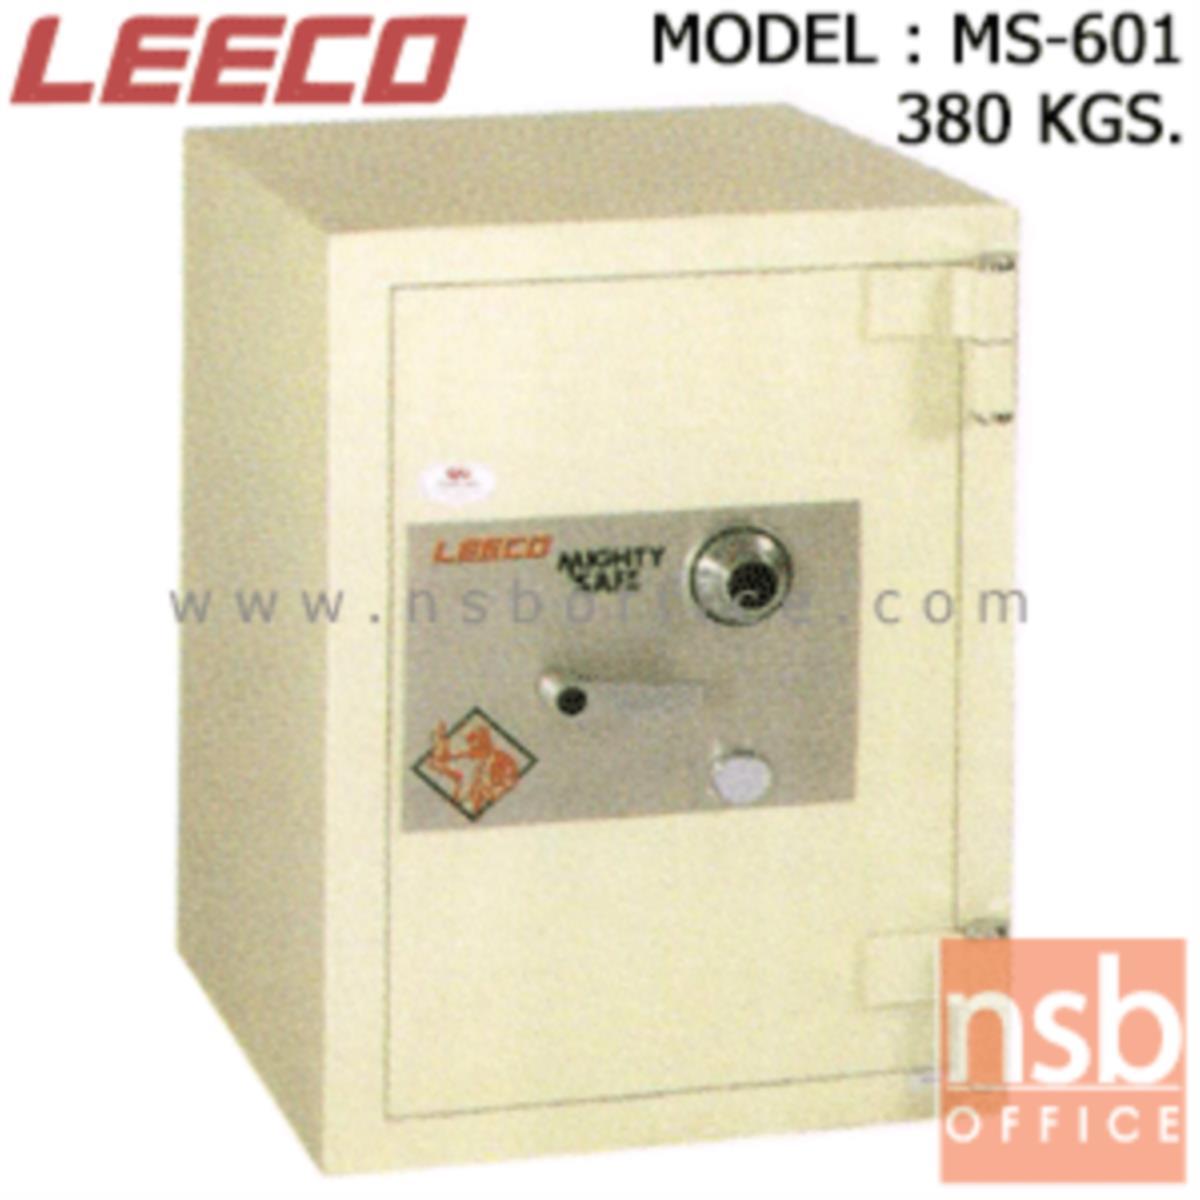 F02A018:ตู้เซฟนิรภัย 380 กก. ลีโก้ รุ่น LEECO-MS-601 มี 1 กุญแจ 1 รหัส (เปลี่ยนรหัสไม่ได้)